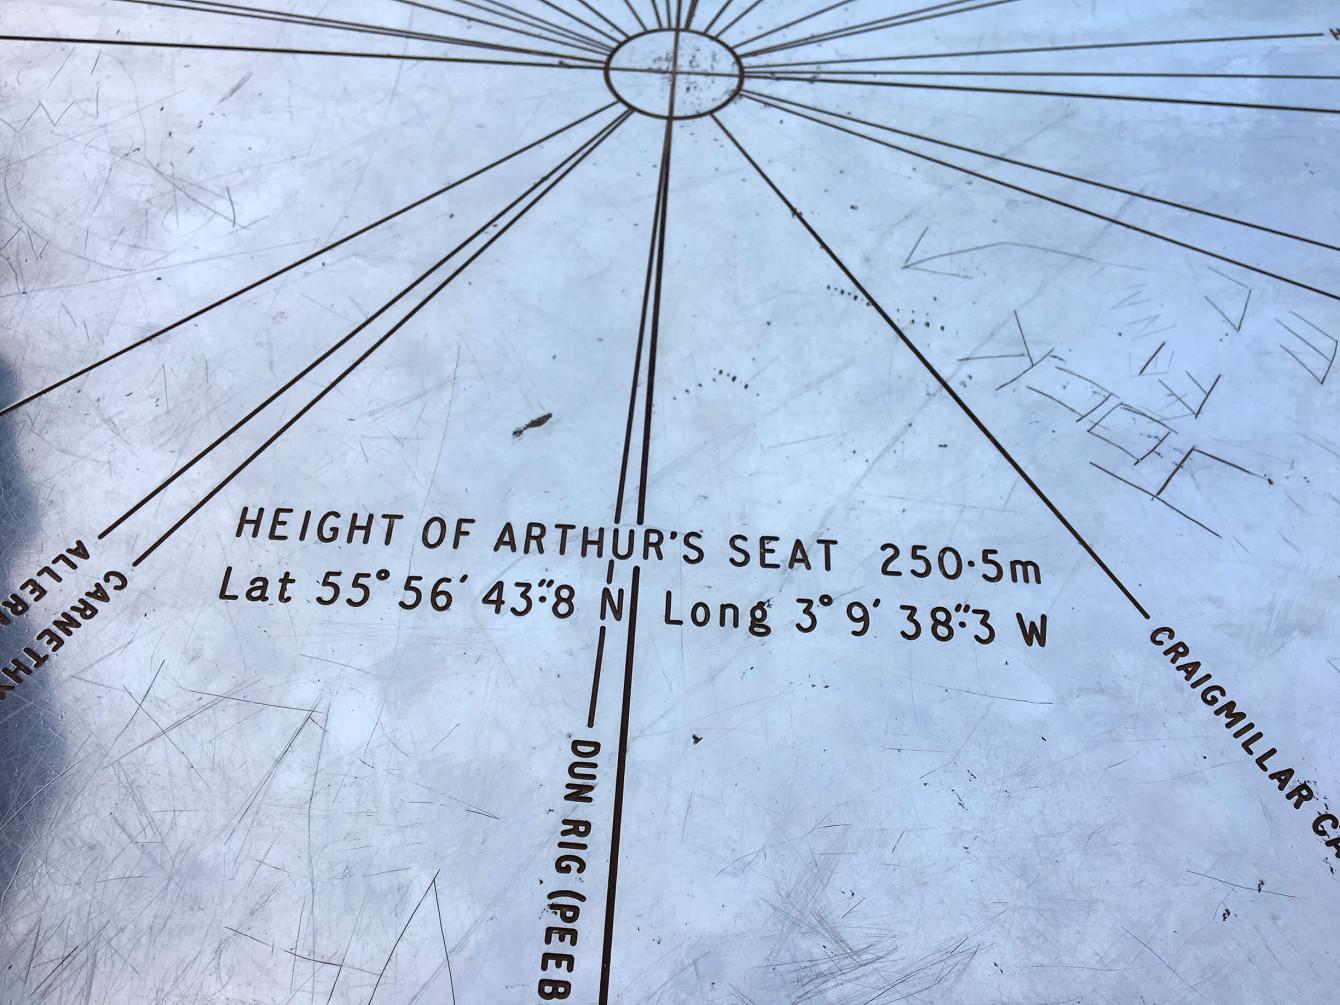 Hauteur de Arthyr's Seat